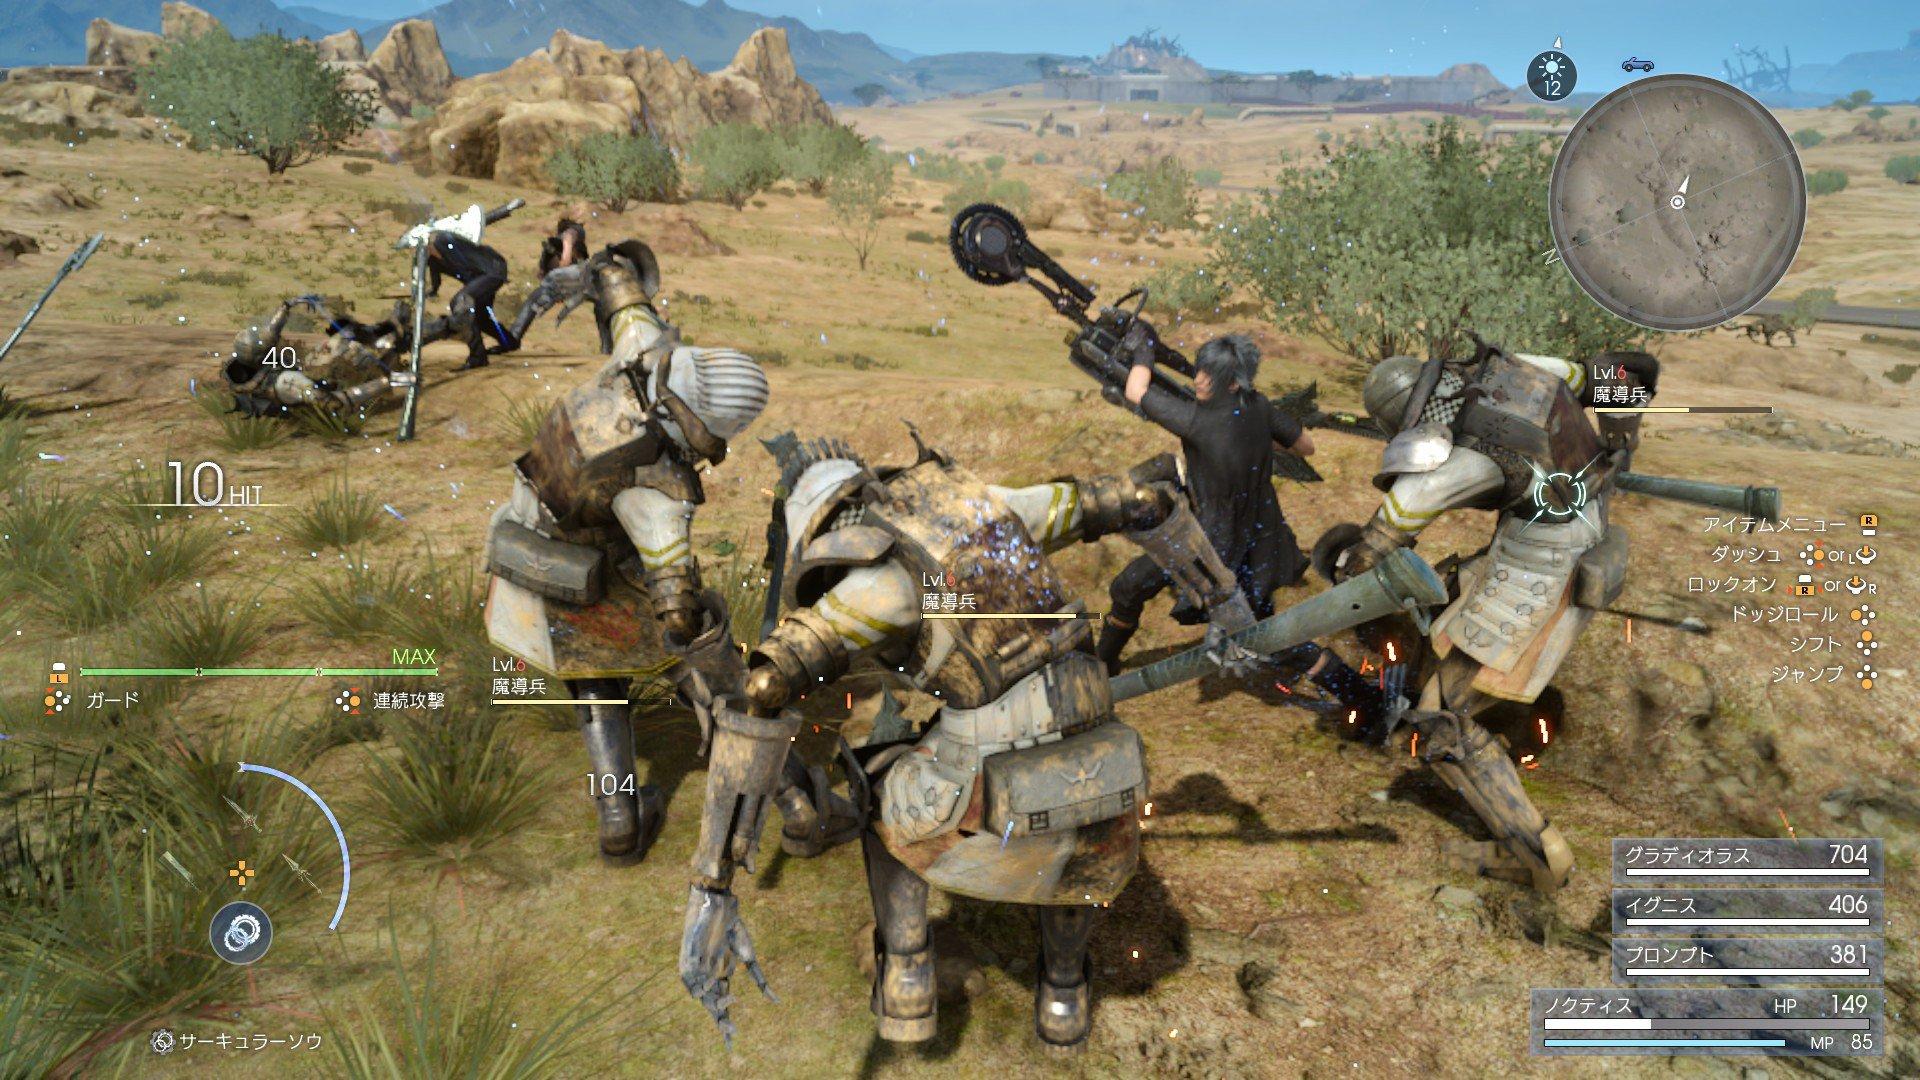 Final Fantasy 15 Combat Screens Show Rifle Handgun